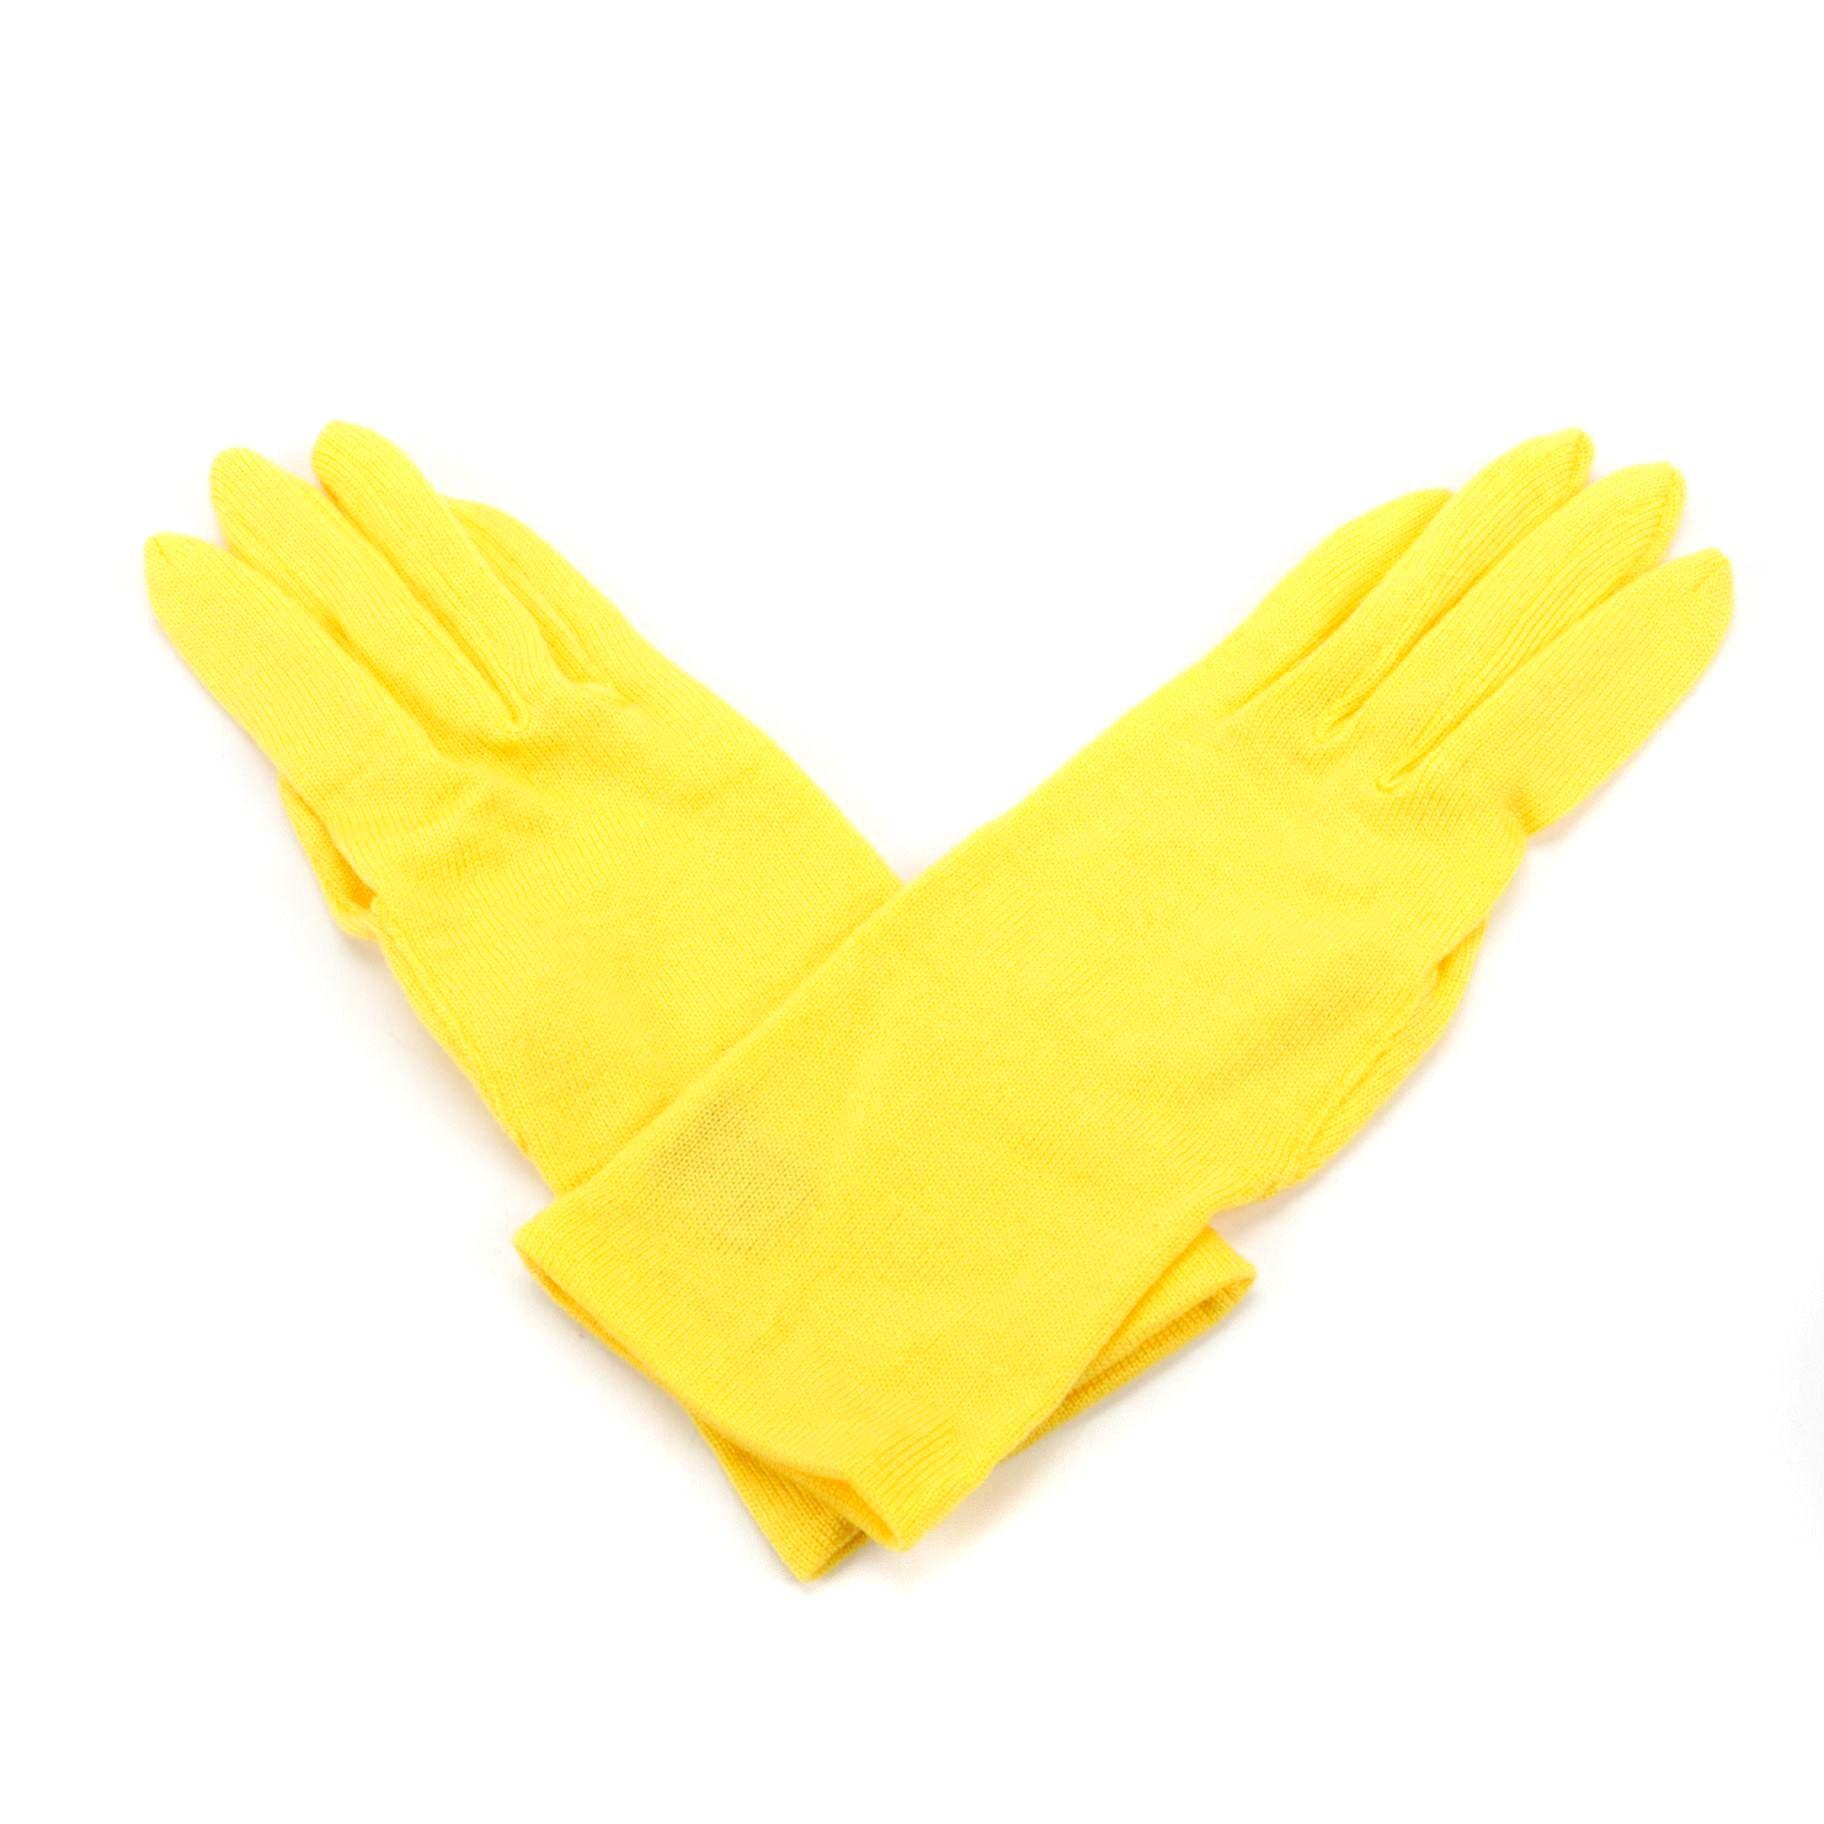 Women's Yohji Yamamoto Gloves